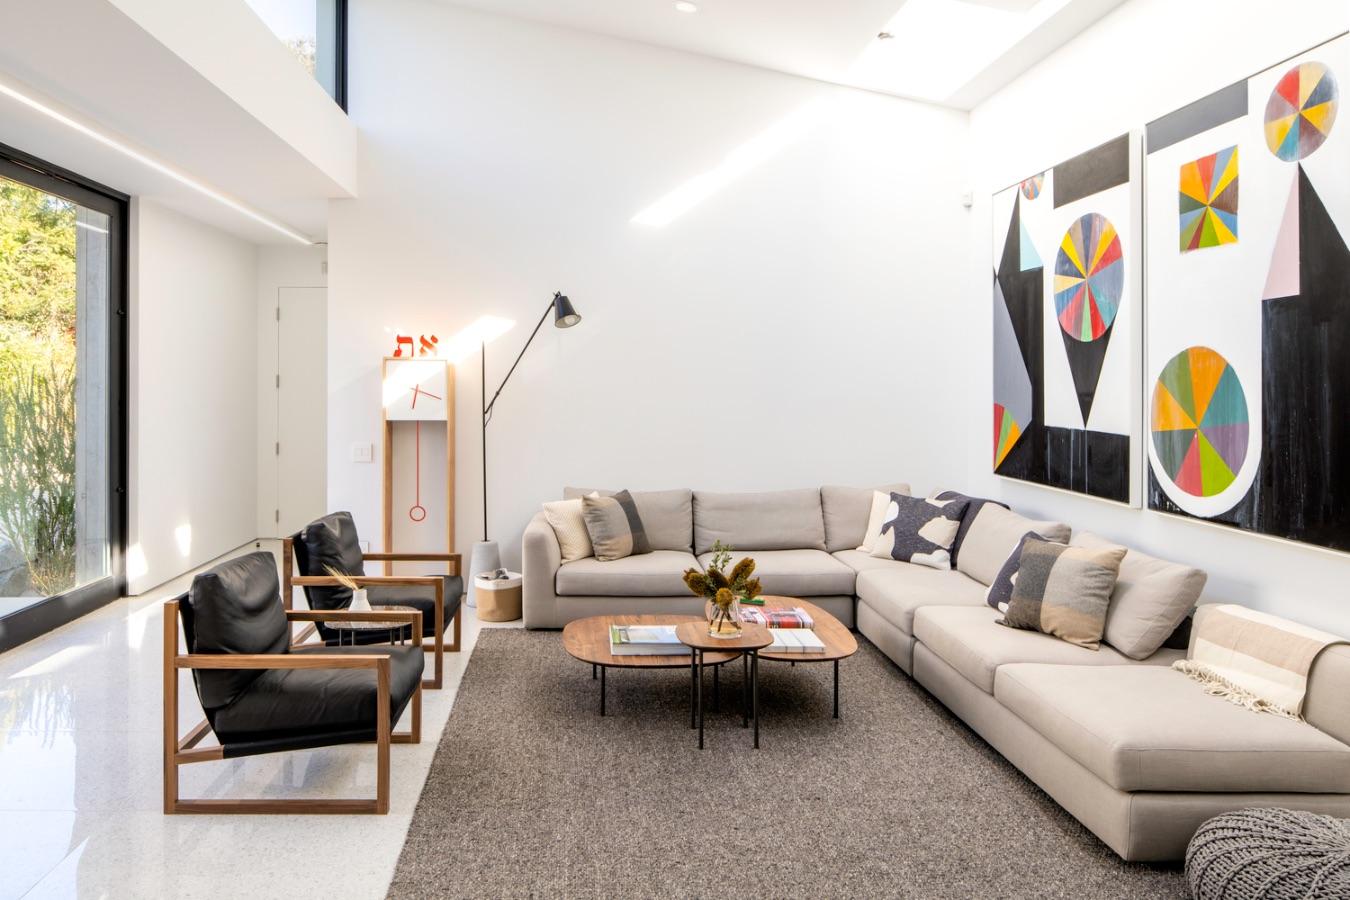 13_Bridge House LA_Dan Brunn Architecture_Inspirationist